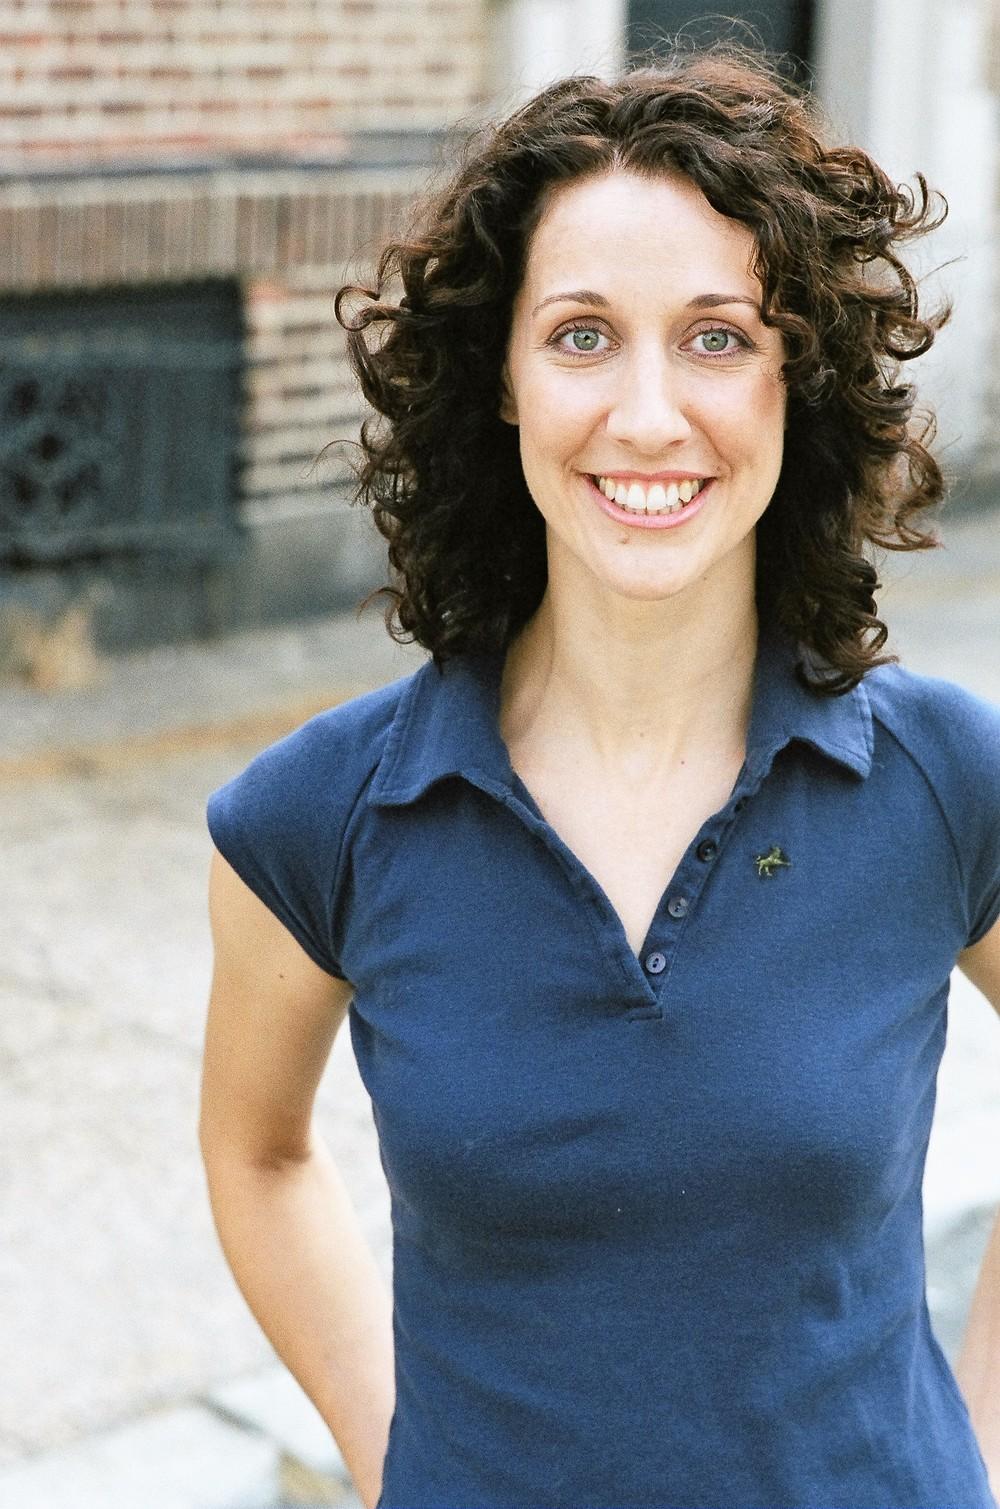 CSz Philadelphia Instructor - Susannah Beckett